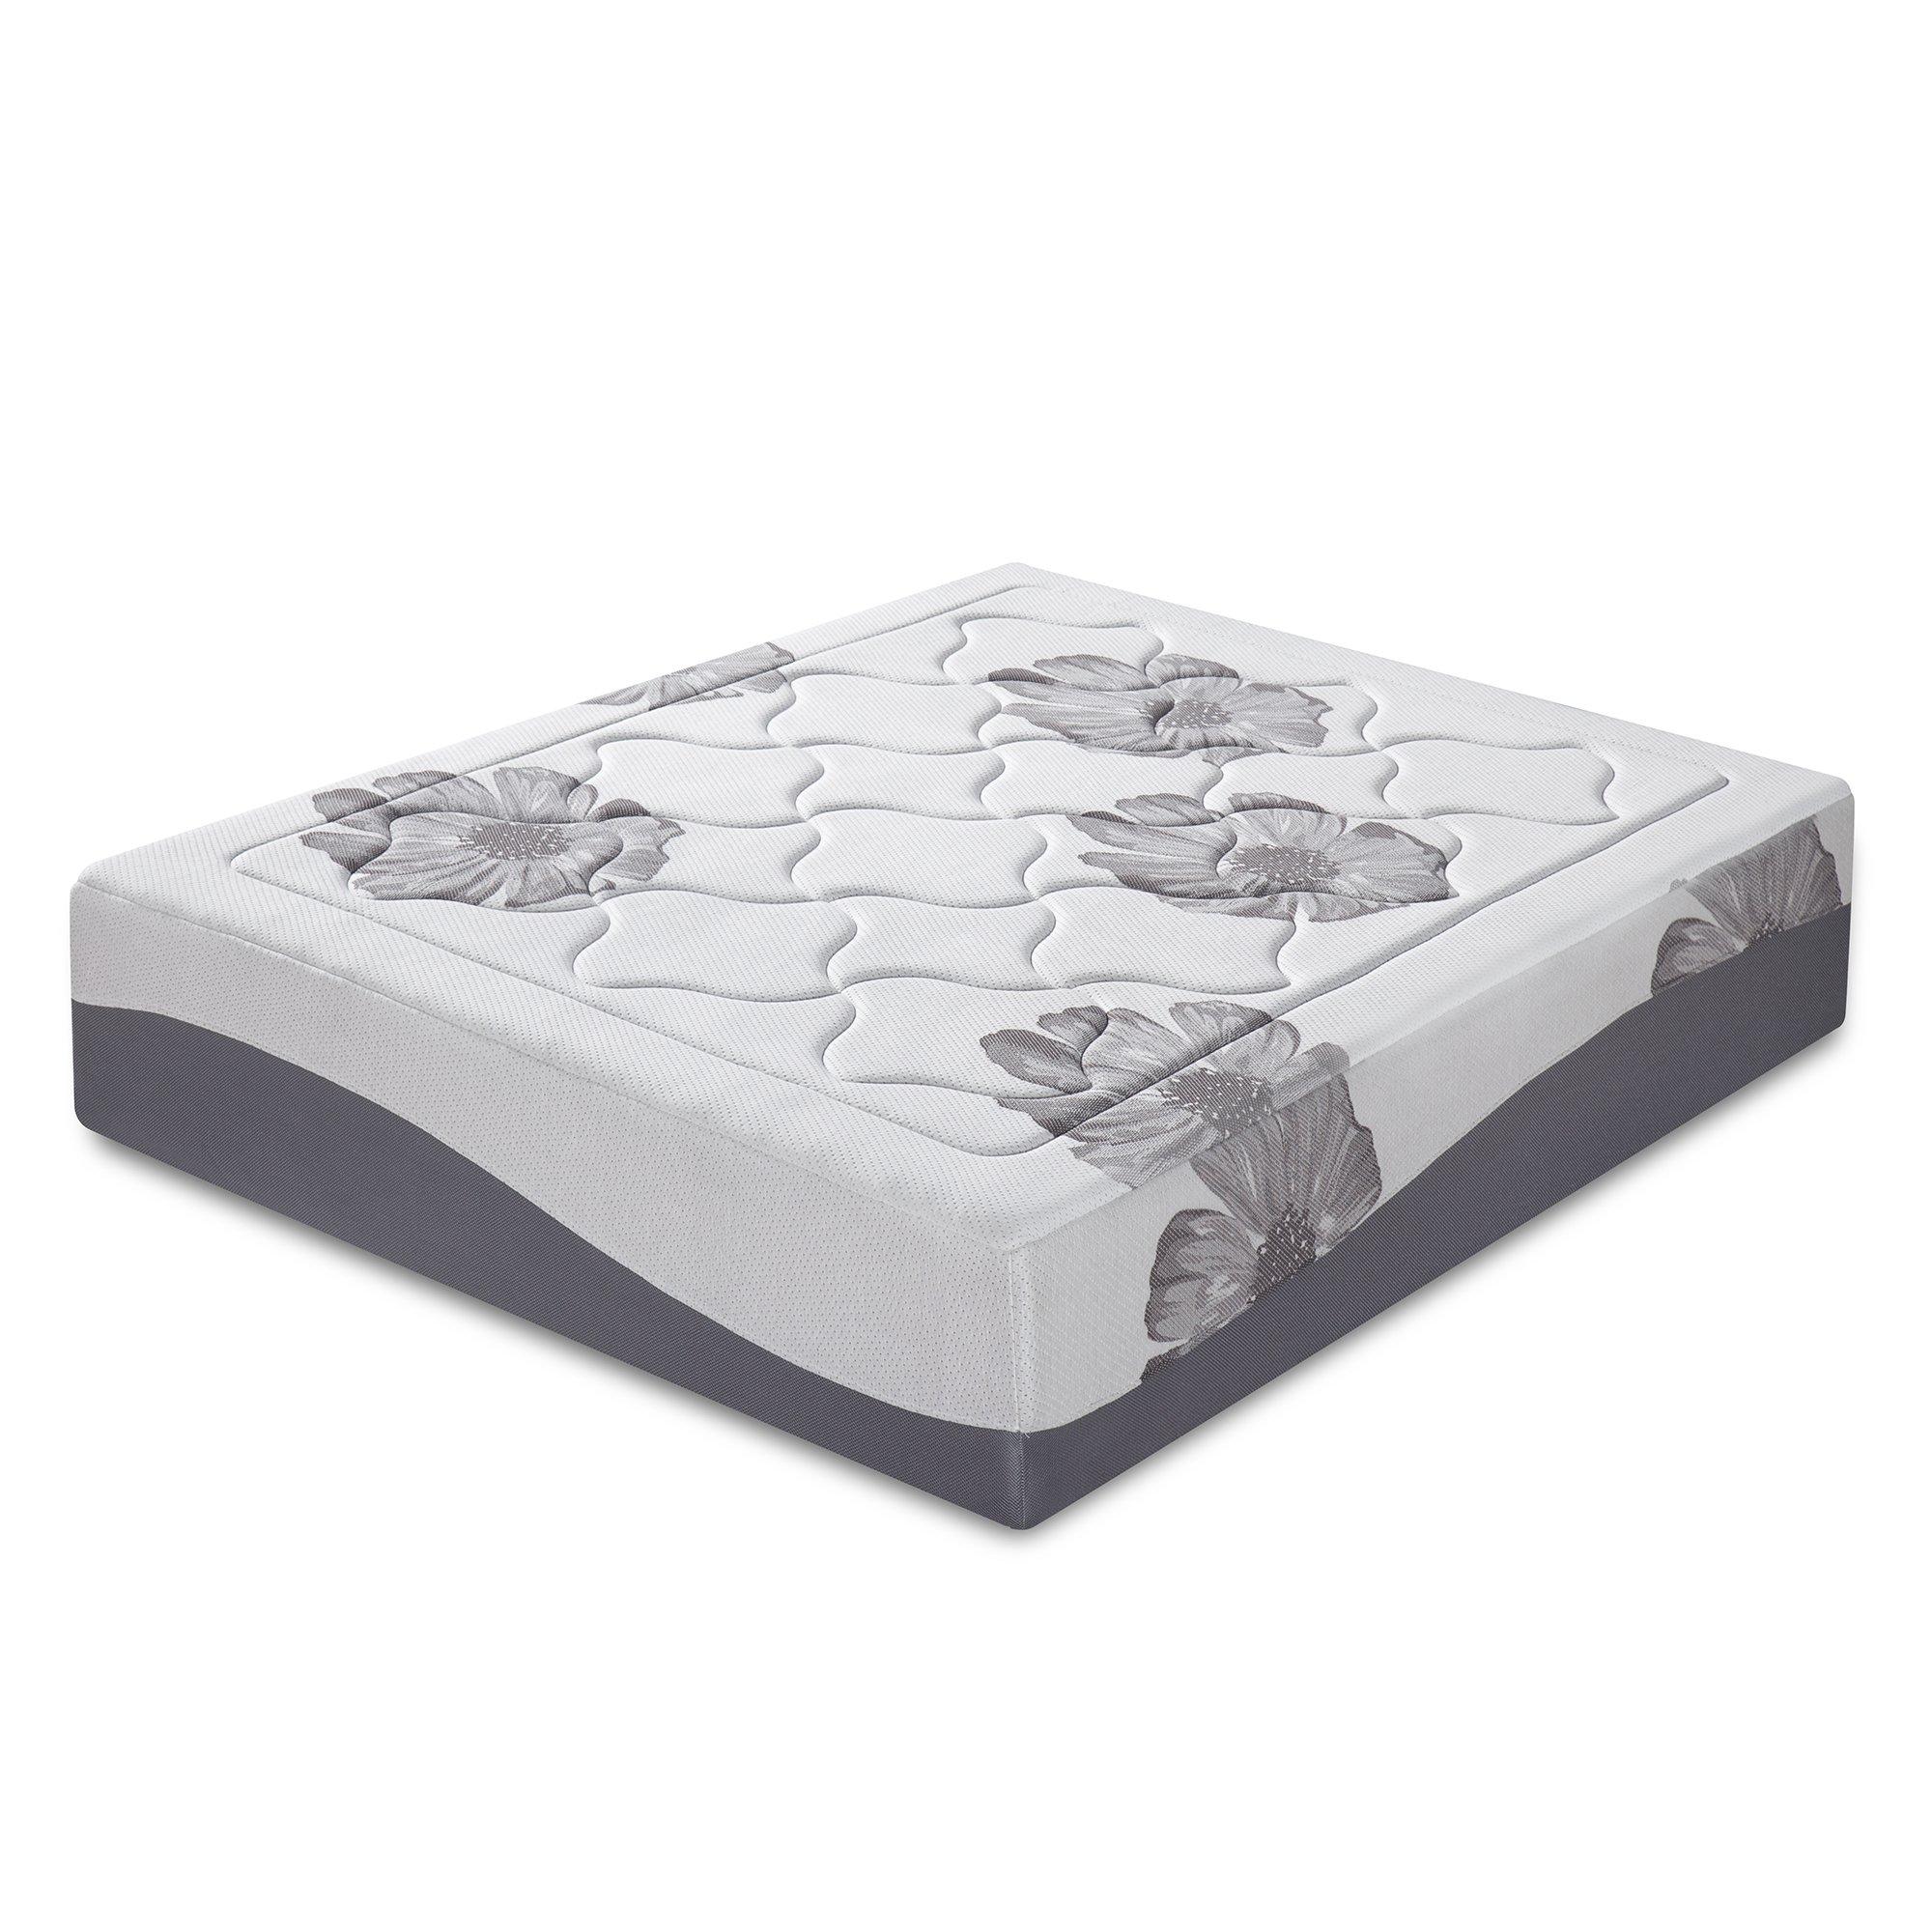 Olee Sleep 12 Inch I Gel Top Tencel Memory Foam Mattress by Olee Sleep